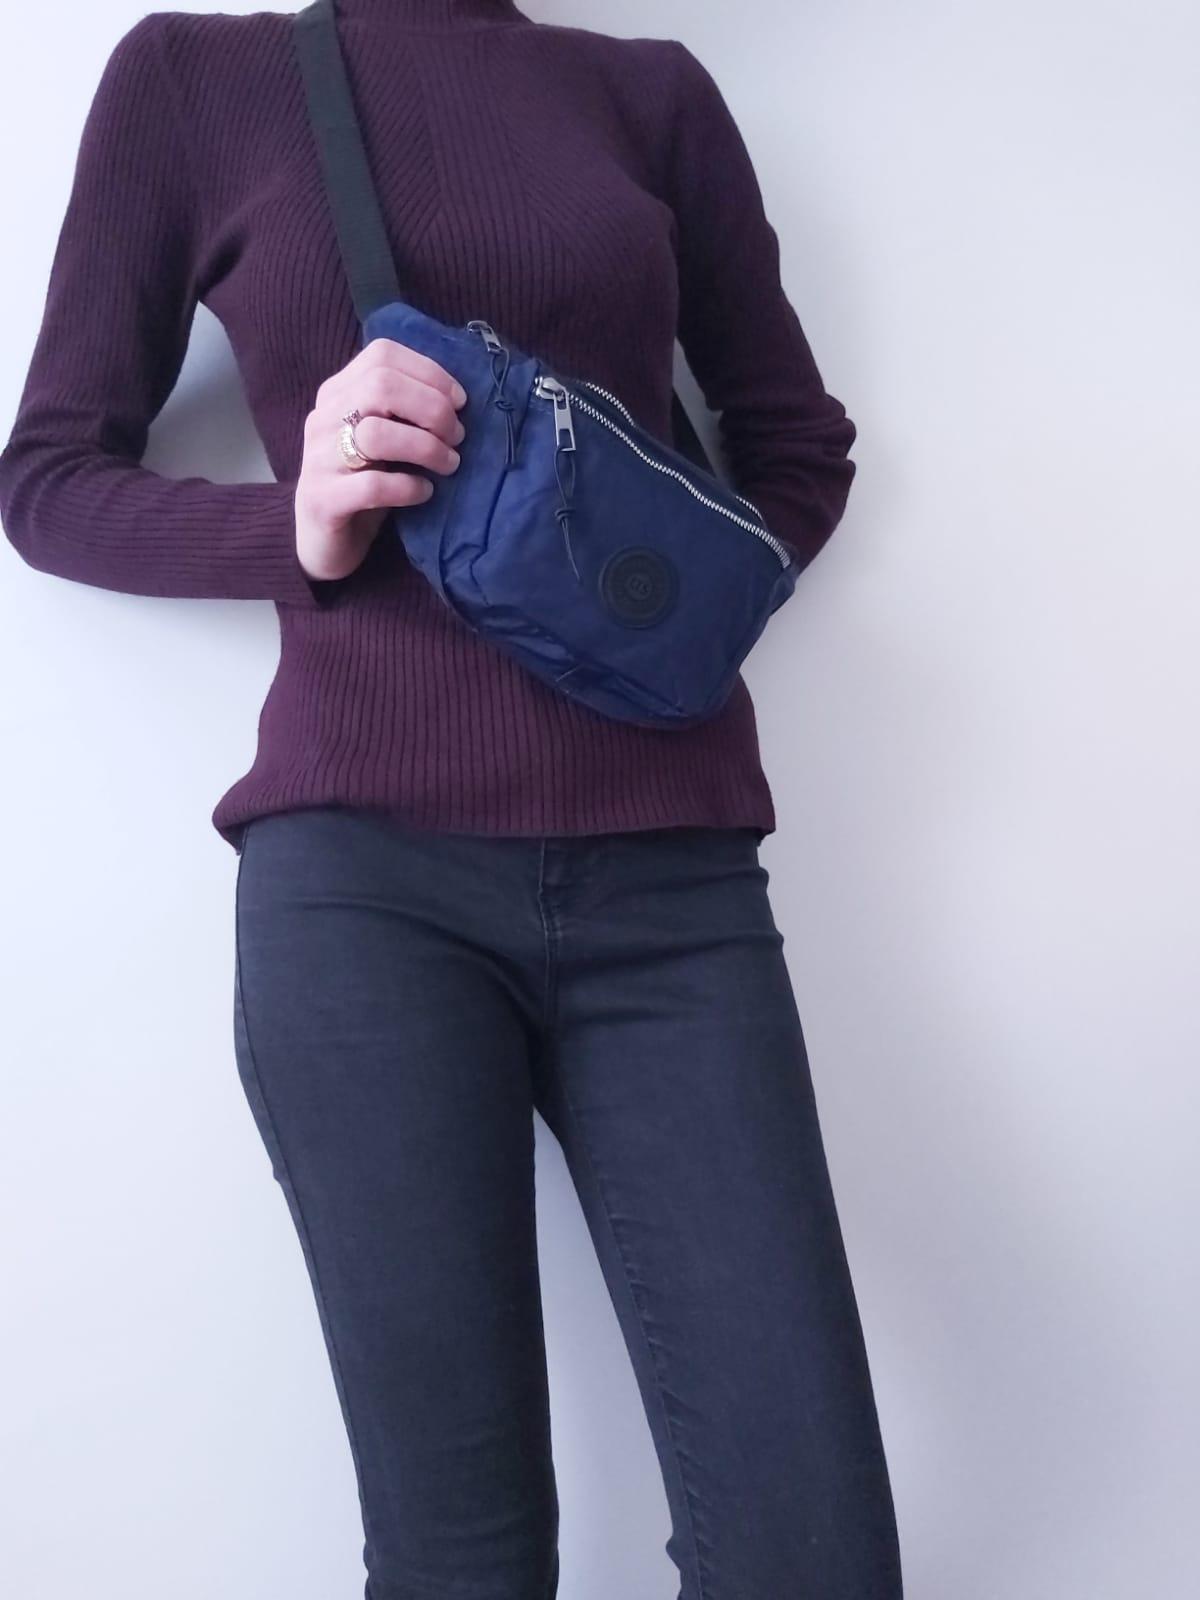 Fashion shoulder bag waist quality running sports women trend waist pack casual crosbody chest bags unisex  travel belt bag